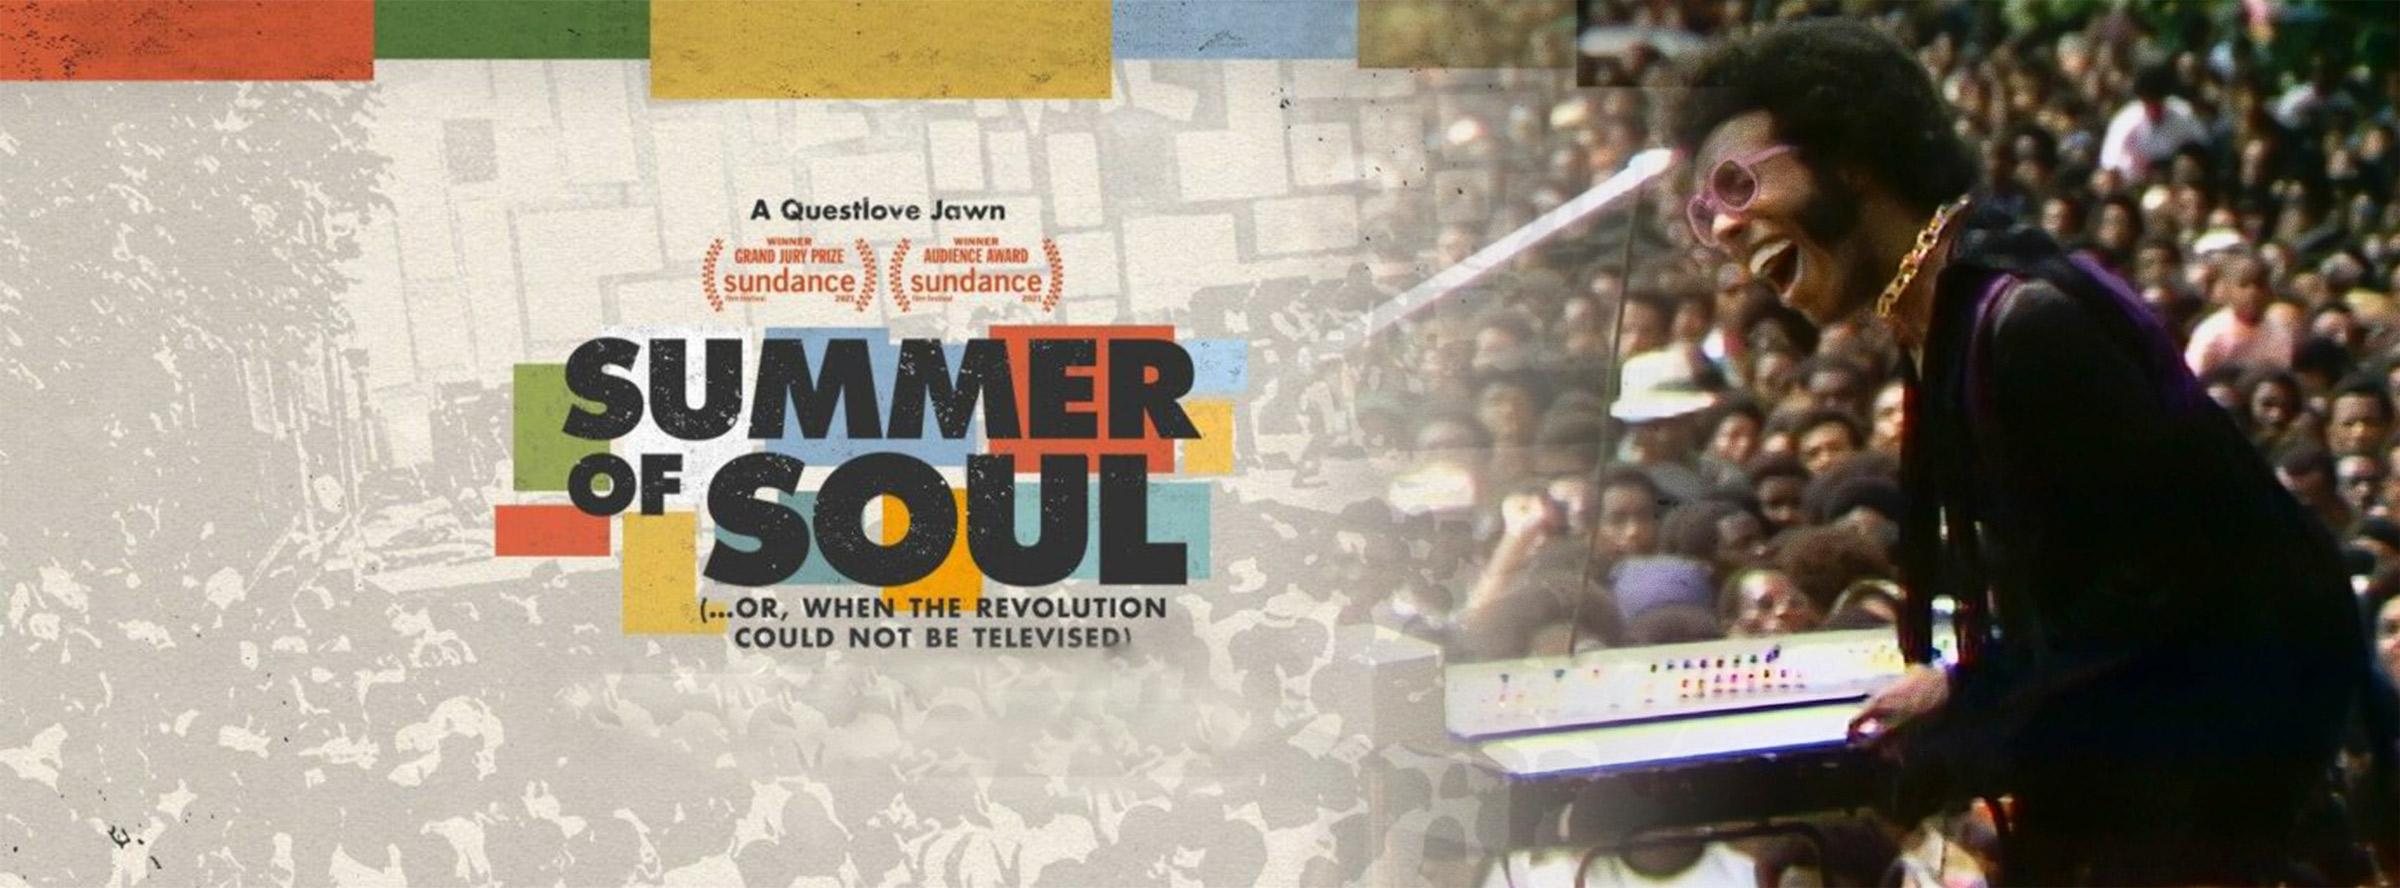 Slider Image for Summer of Soul (...Or, When the Revolution Could N